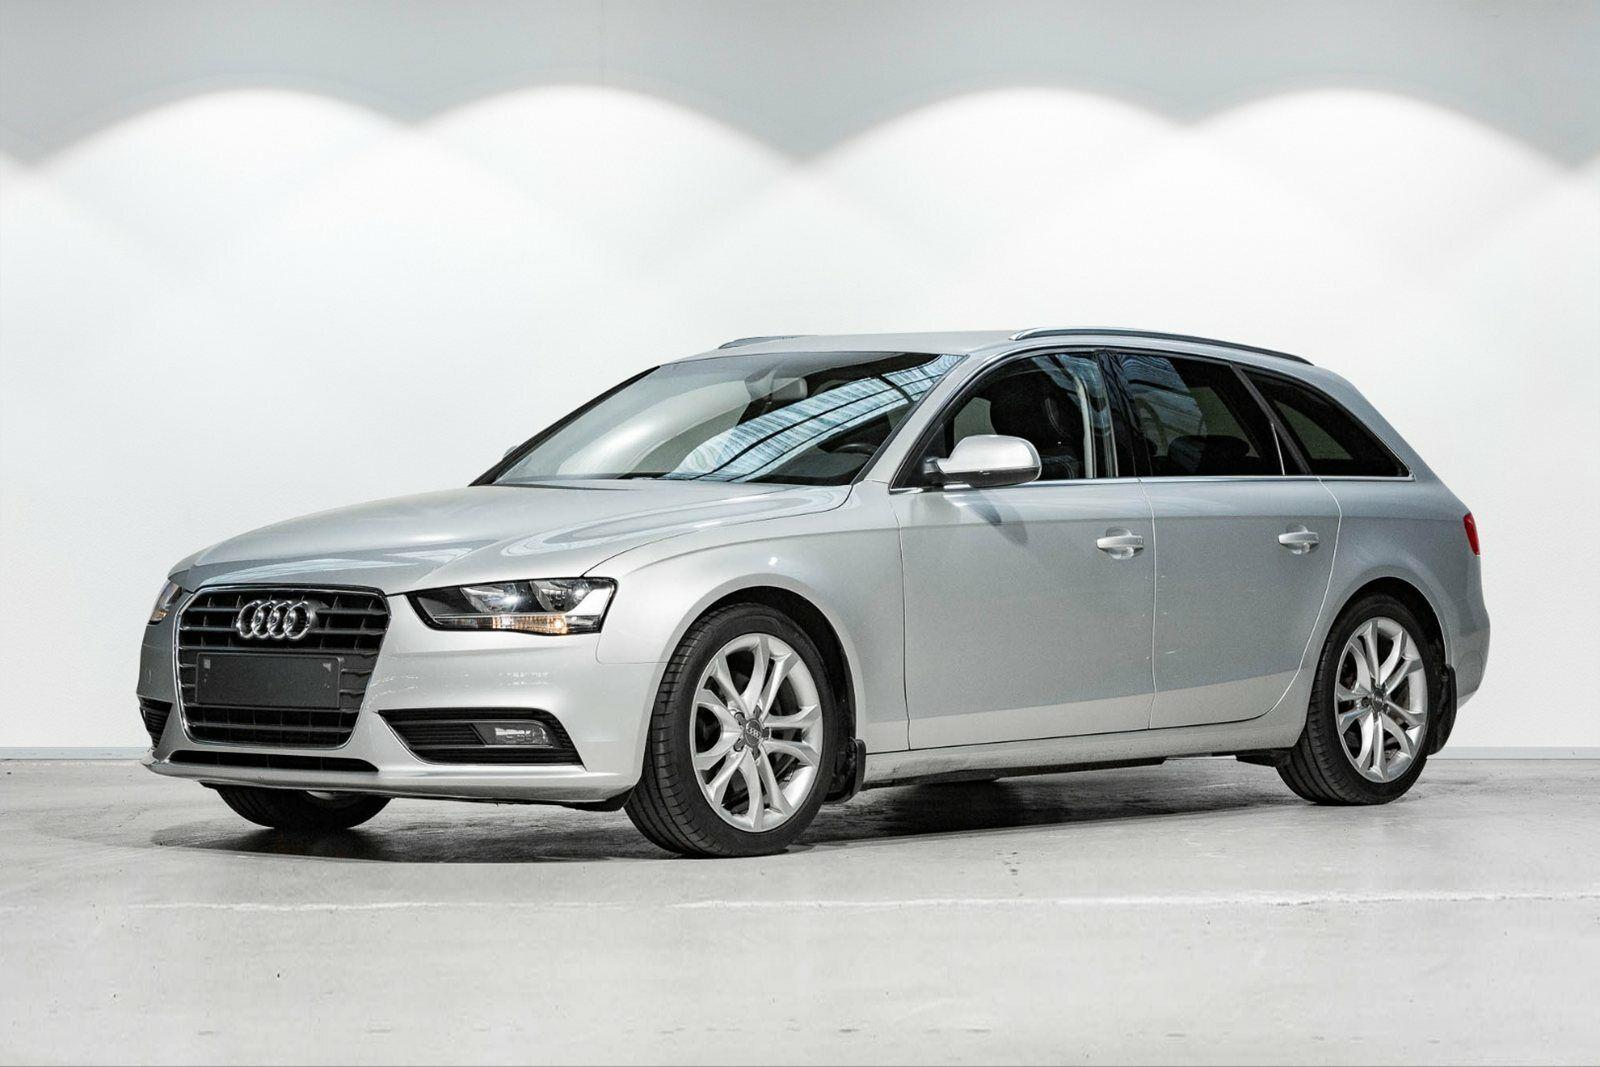 Audi A4 2,0 TDi 136 Avant 5d - 169.000 kr.